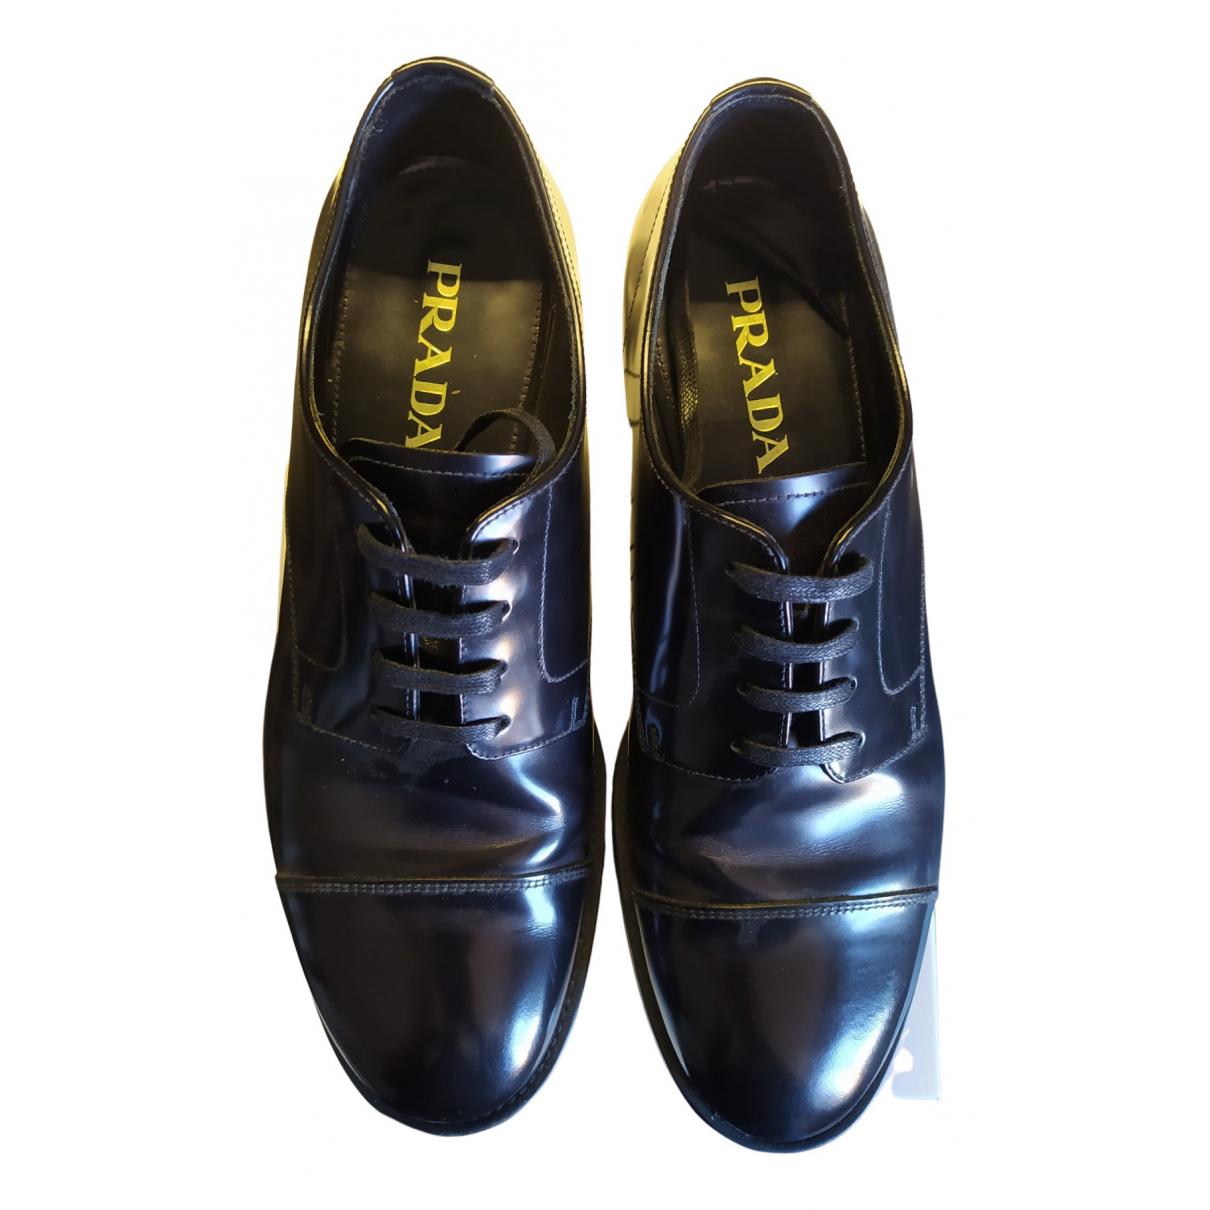 Prada N Black Leather Flats for Men 42 EU